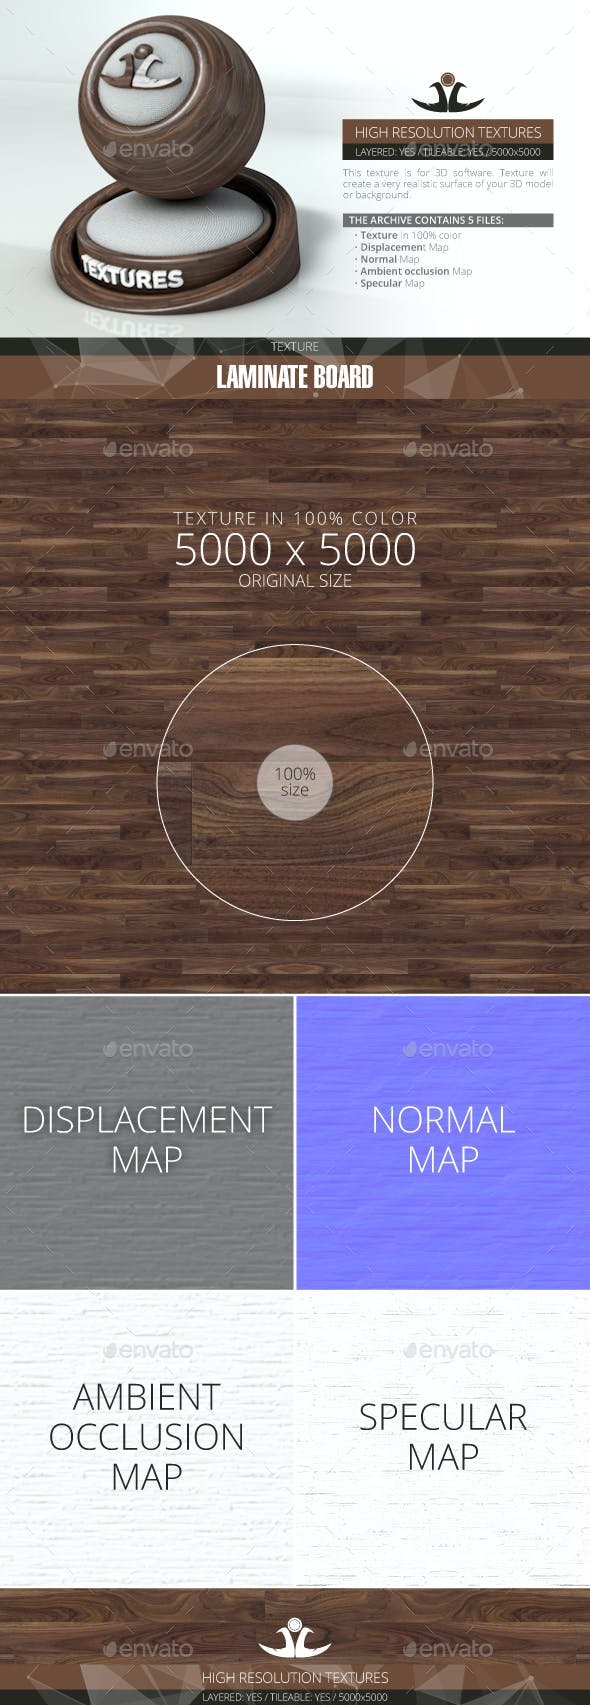 Laminate Board 59 - 3DOcean Item for Sale